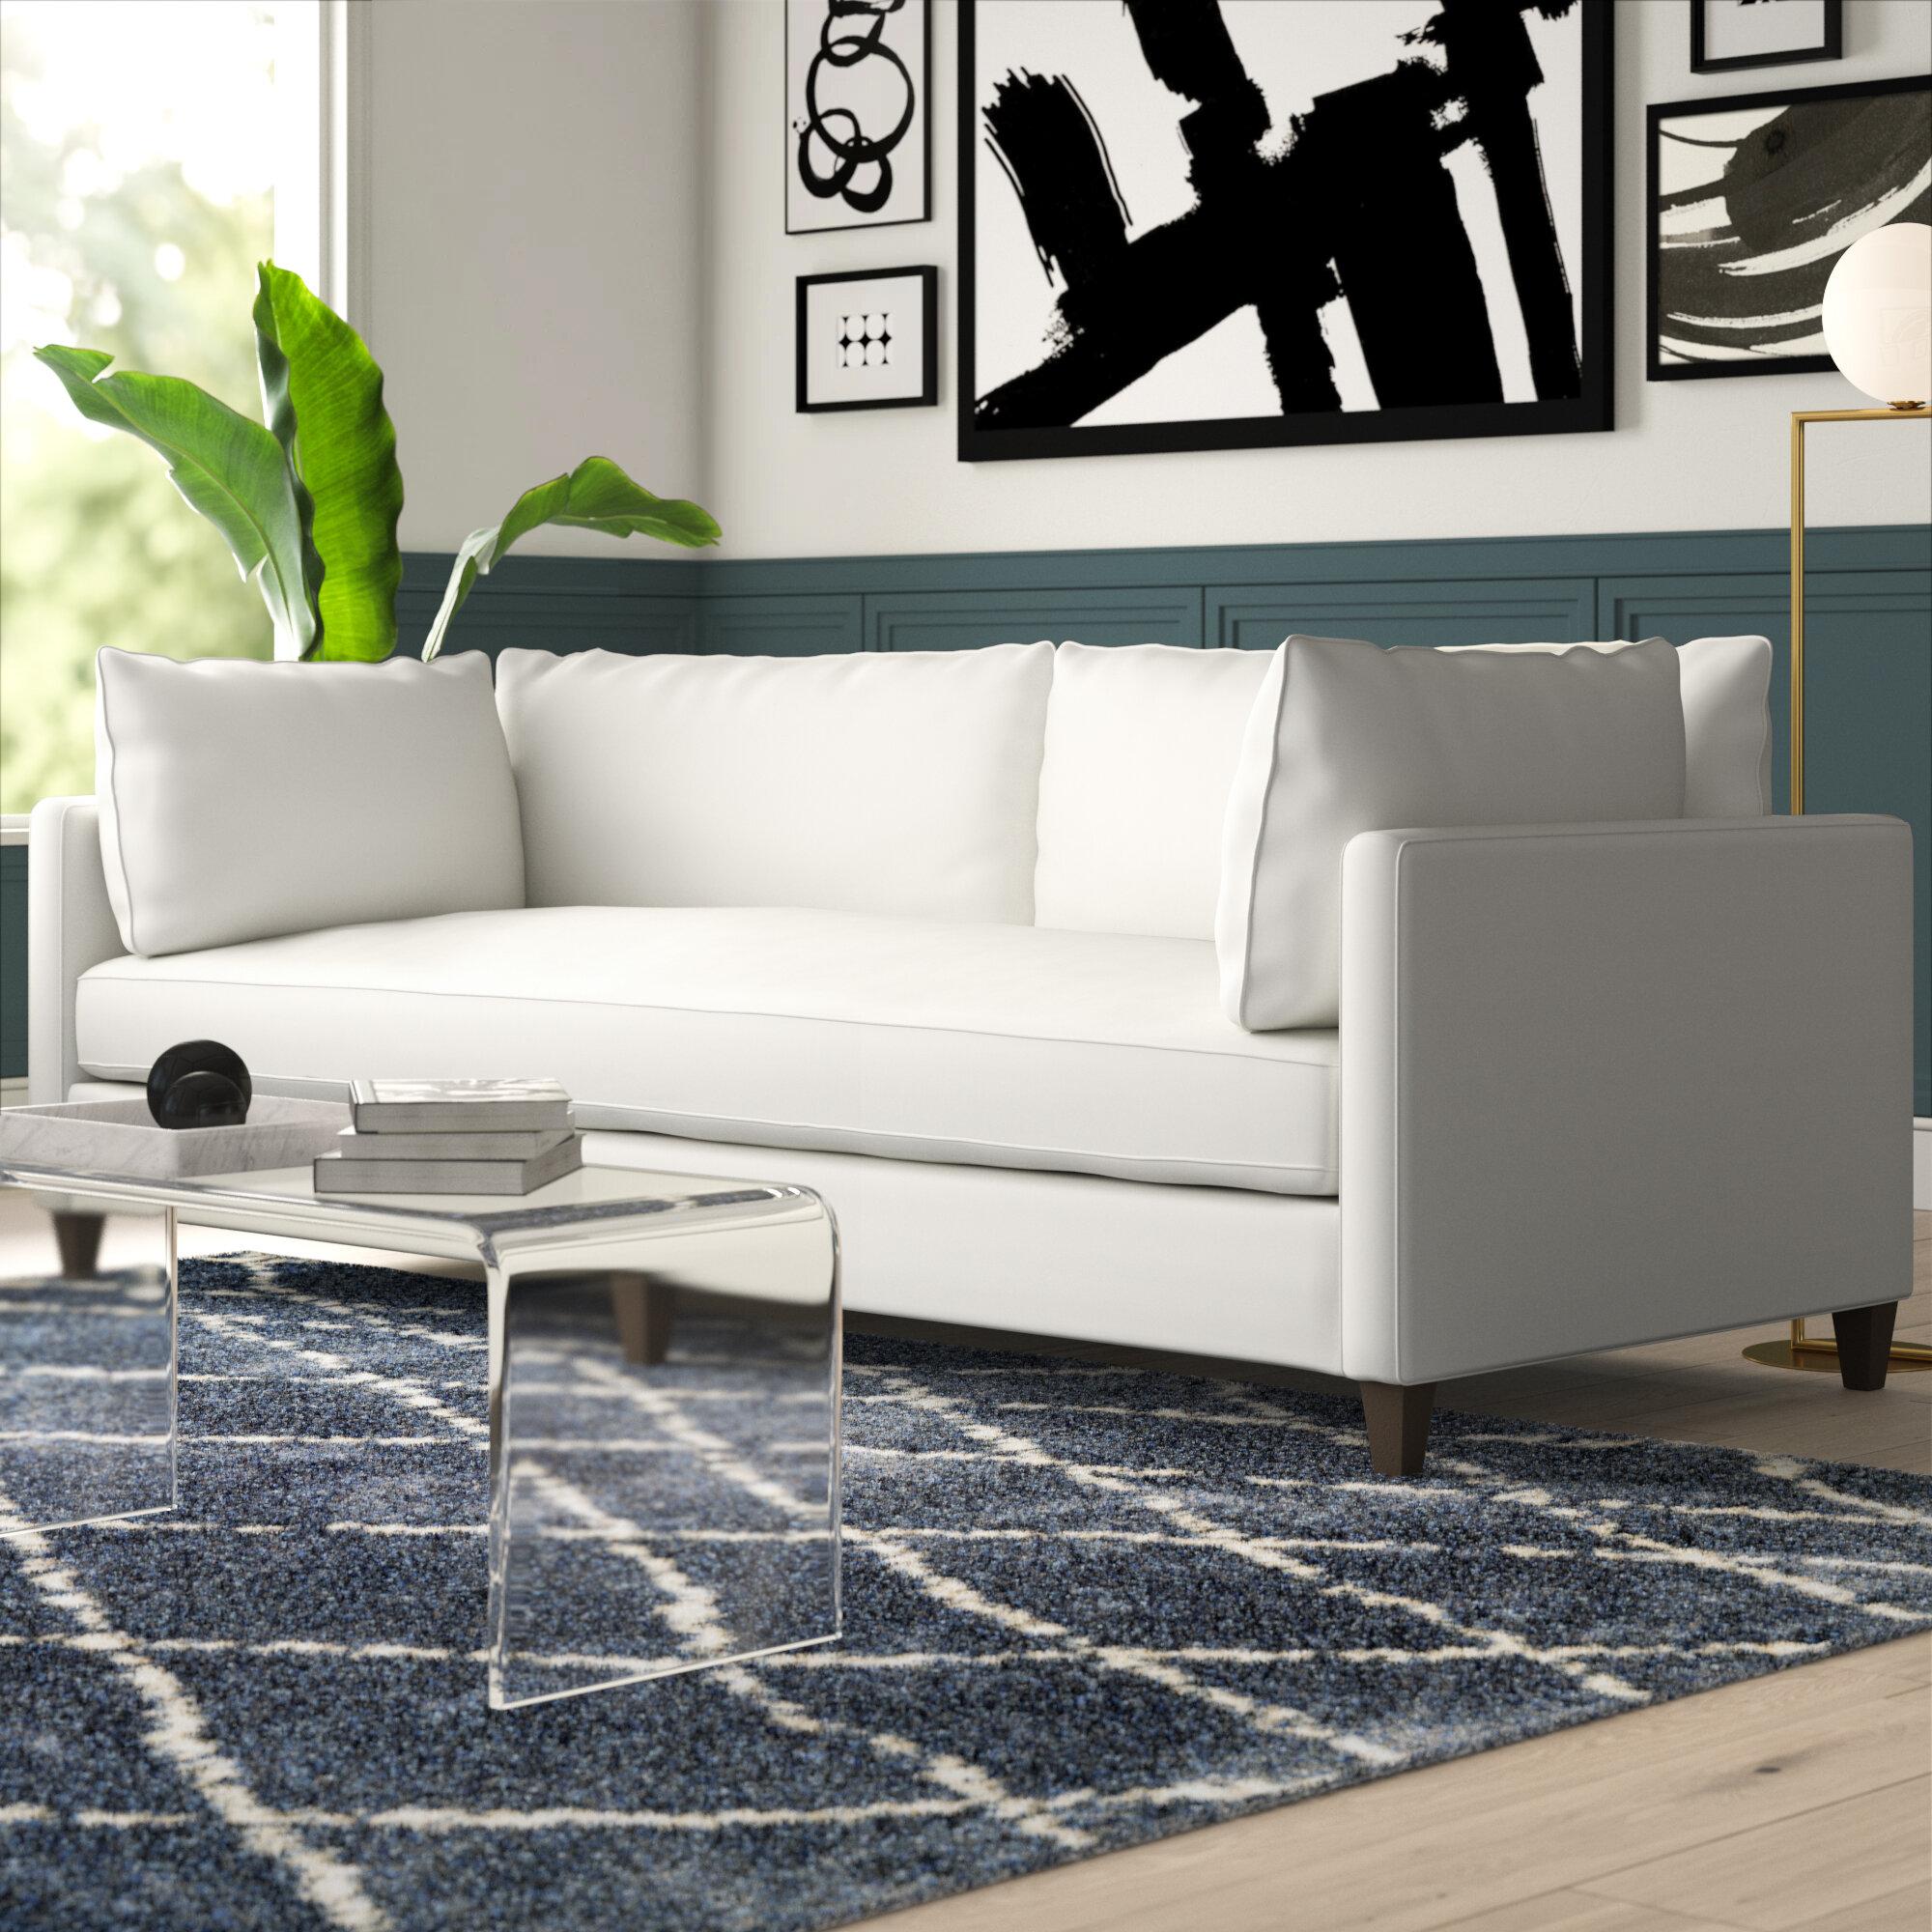 North Burnet Gateway 100 Square Arm Sofa Reviews Joss Main